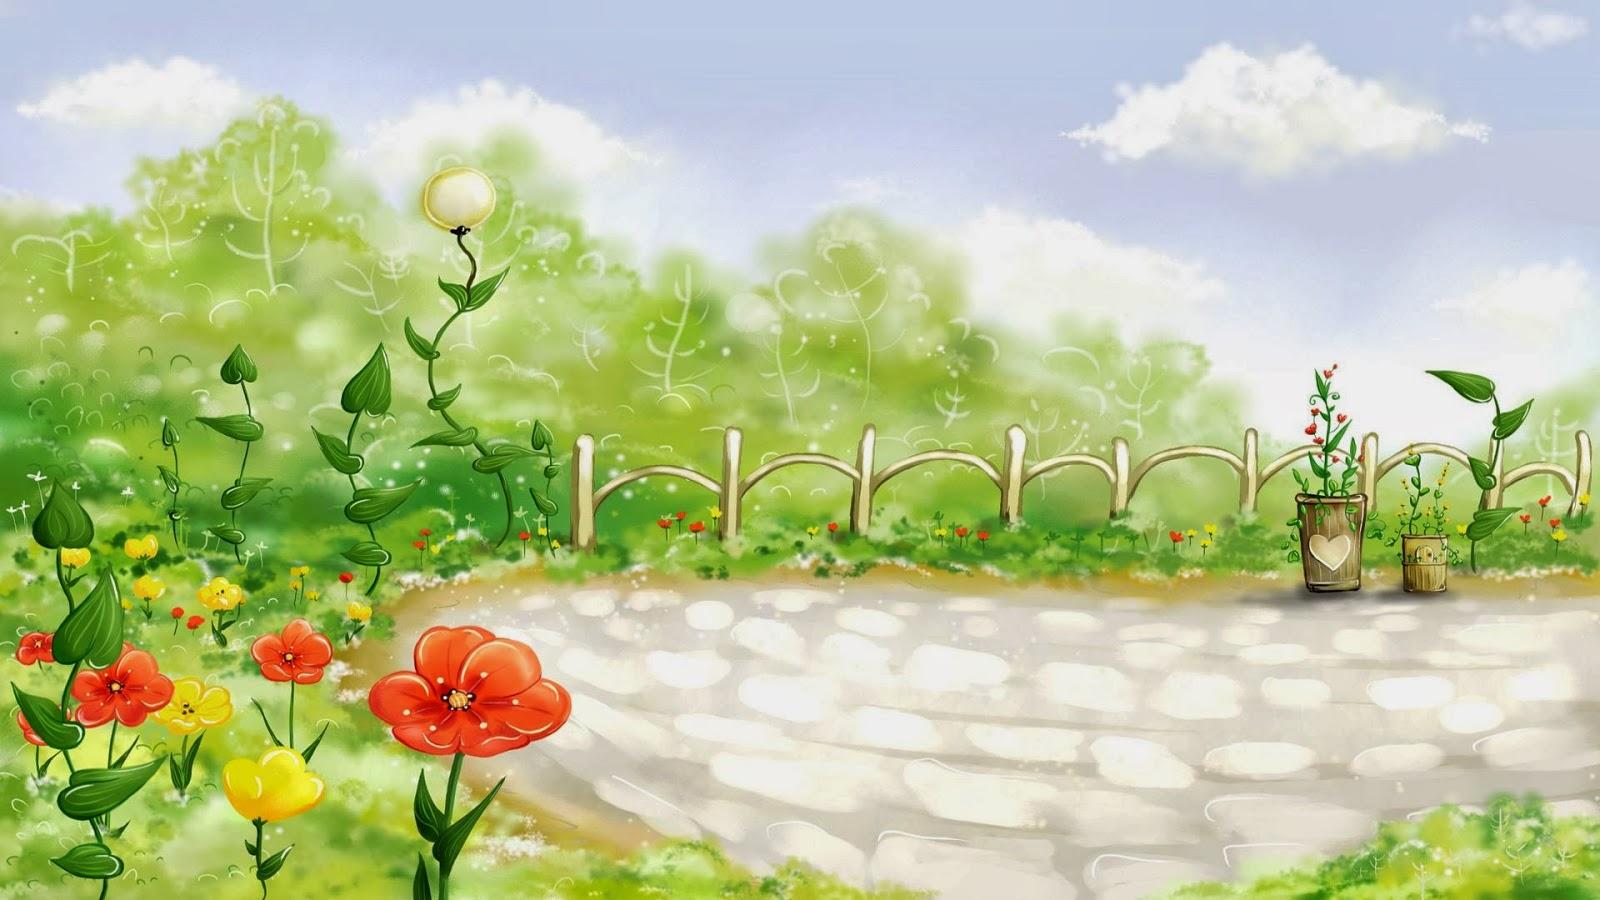 Cartoon Garden Wallpaper Free | Pic Gallery